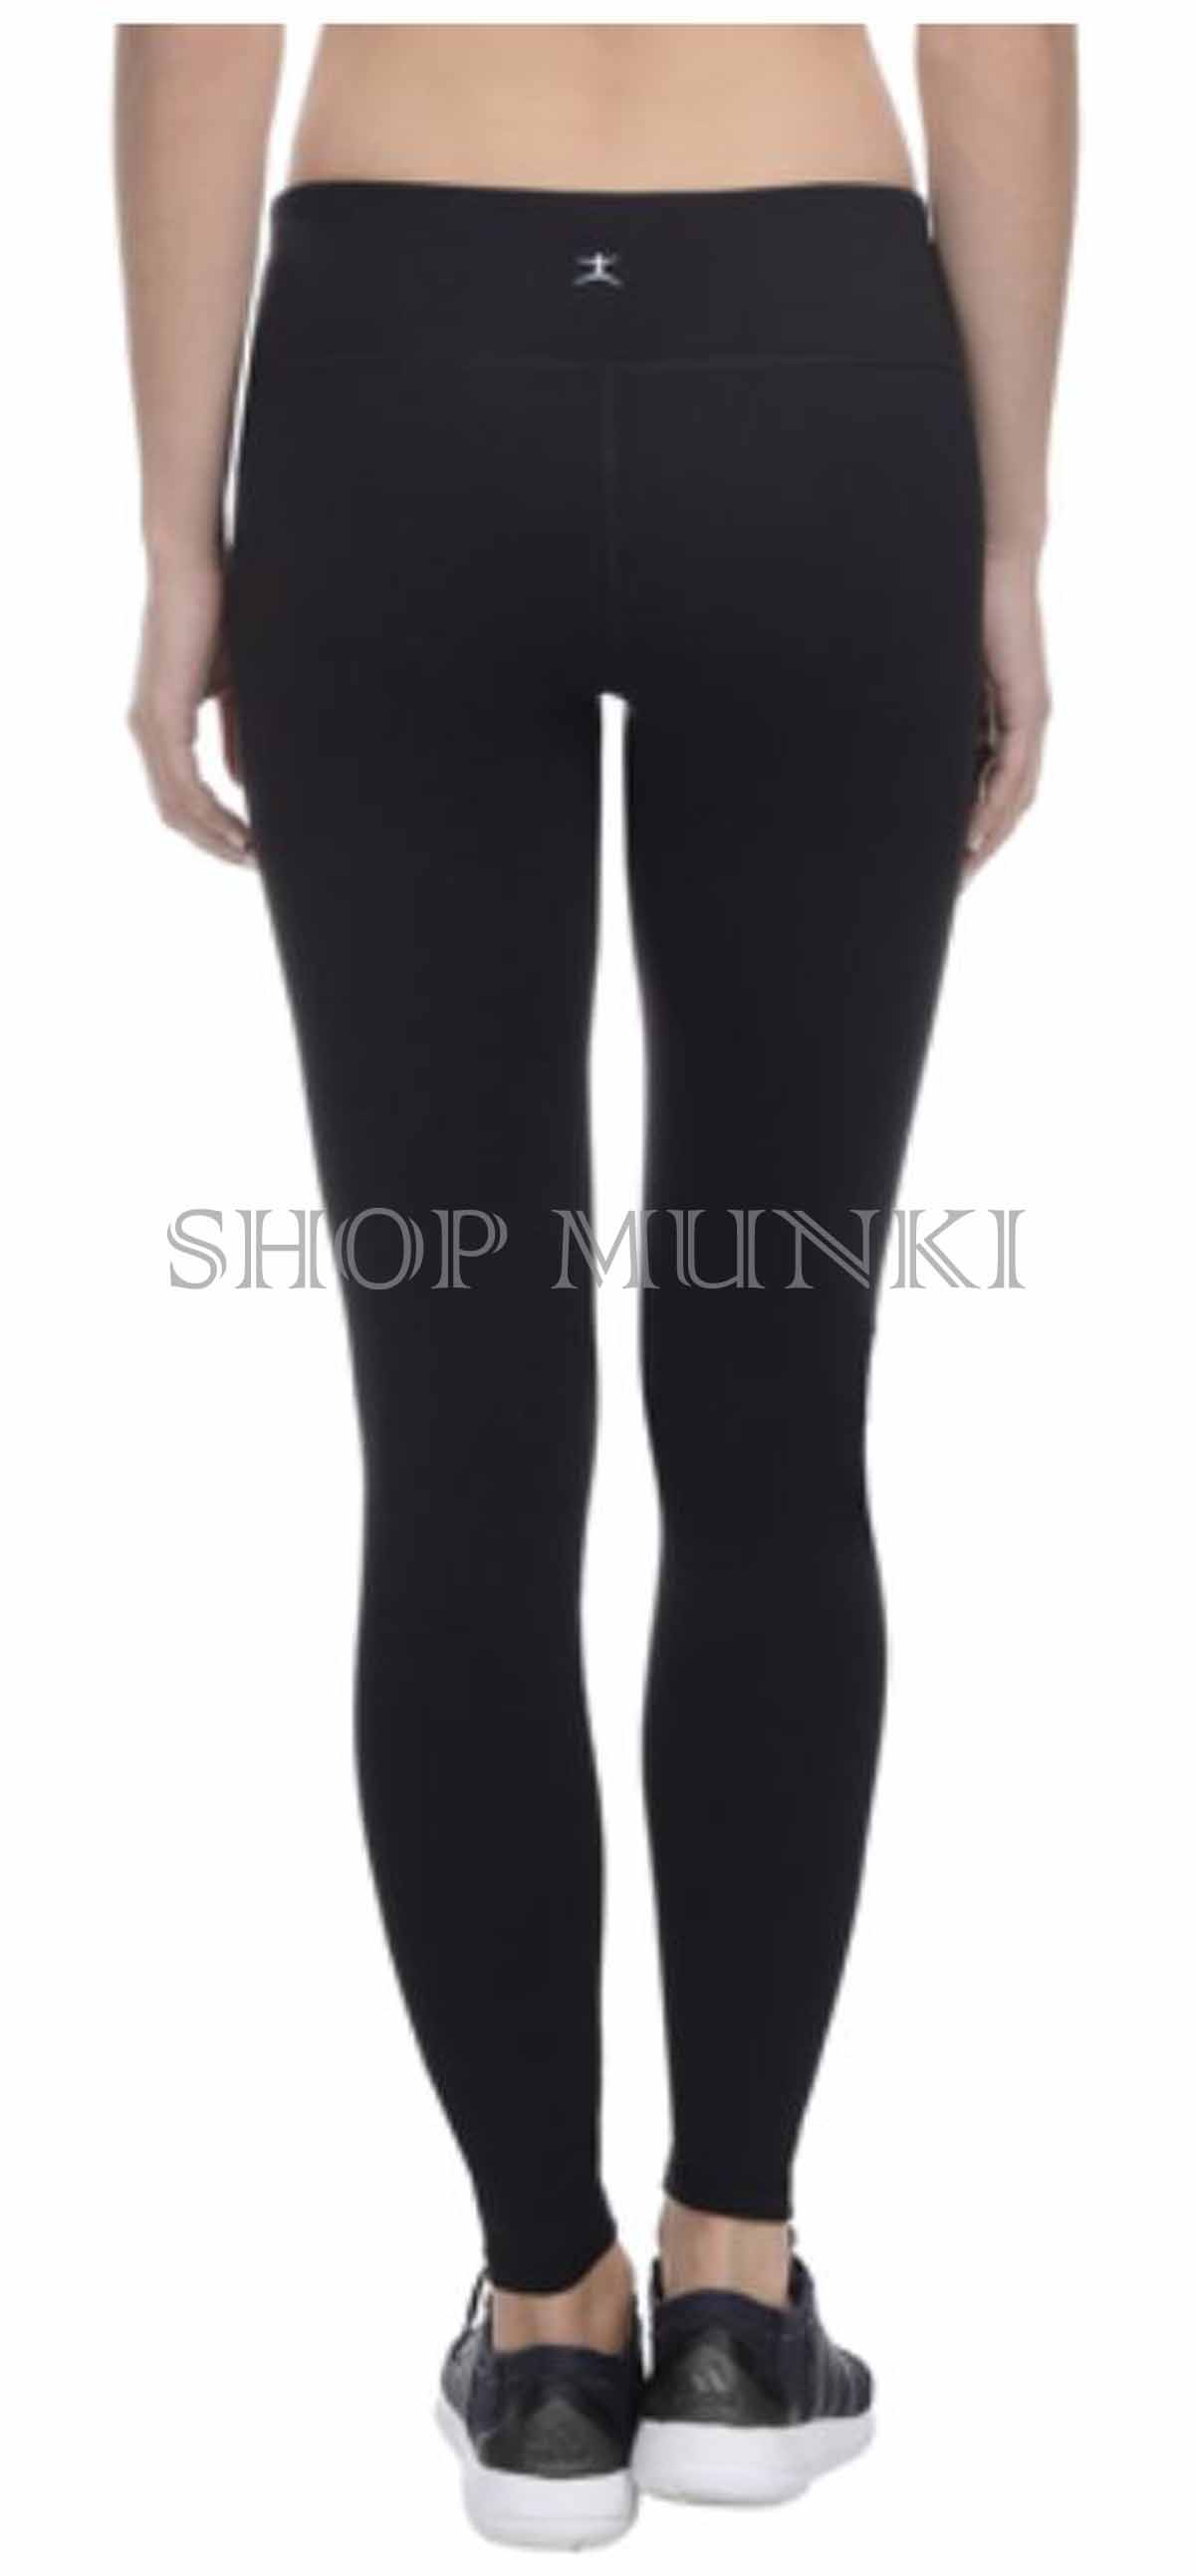 ed0f07eea50d2 Danskin Womens Supplex CoolMax Active Stretch Printed Ankle Legging ...